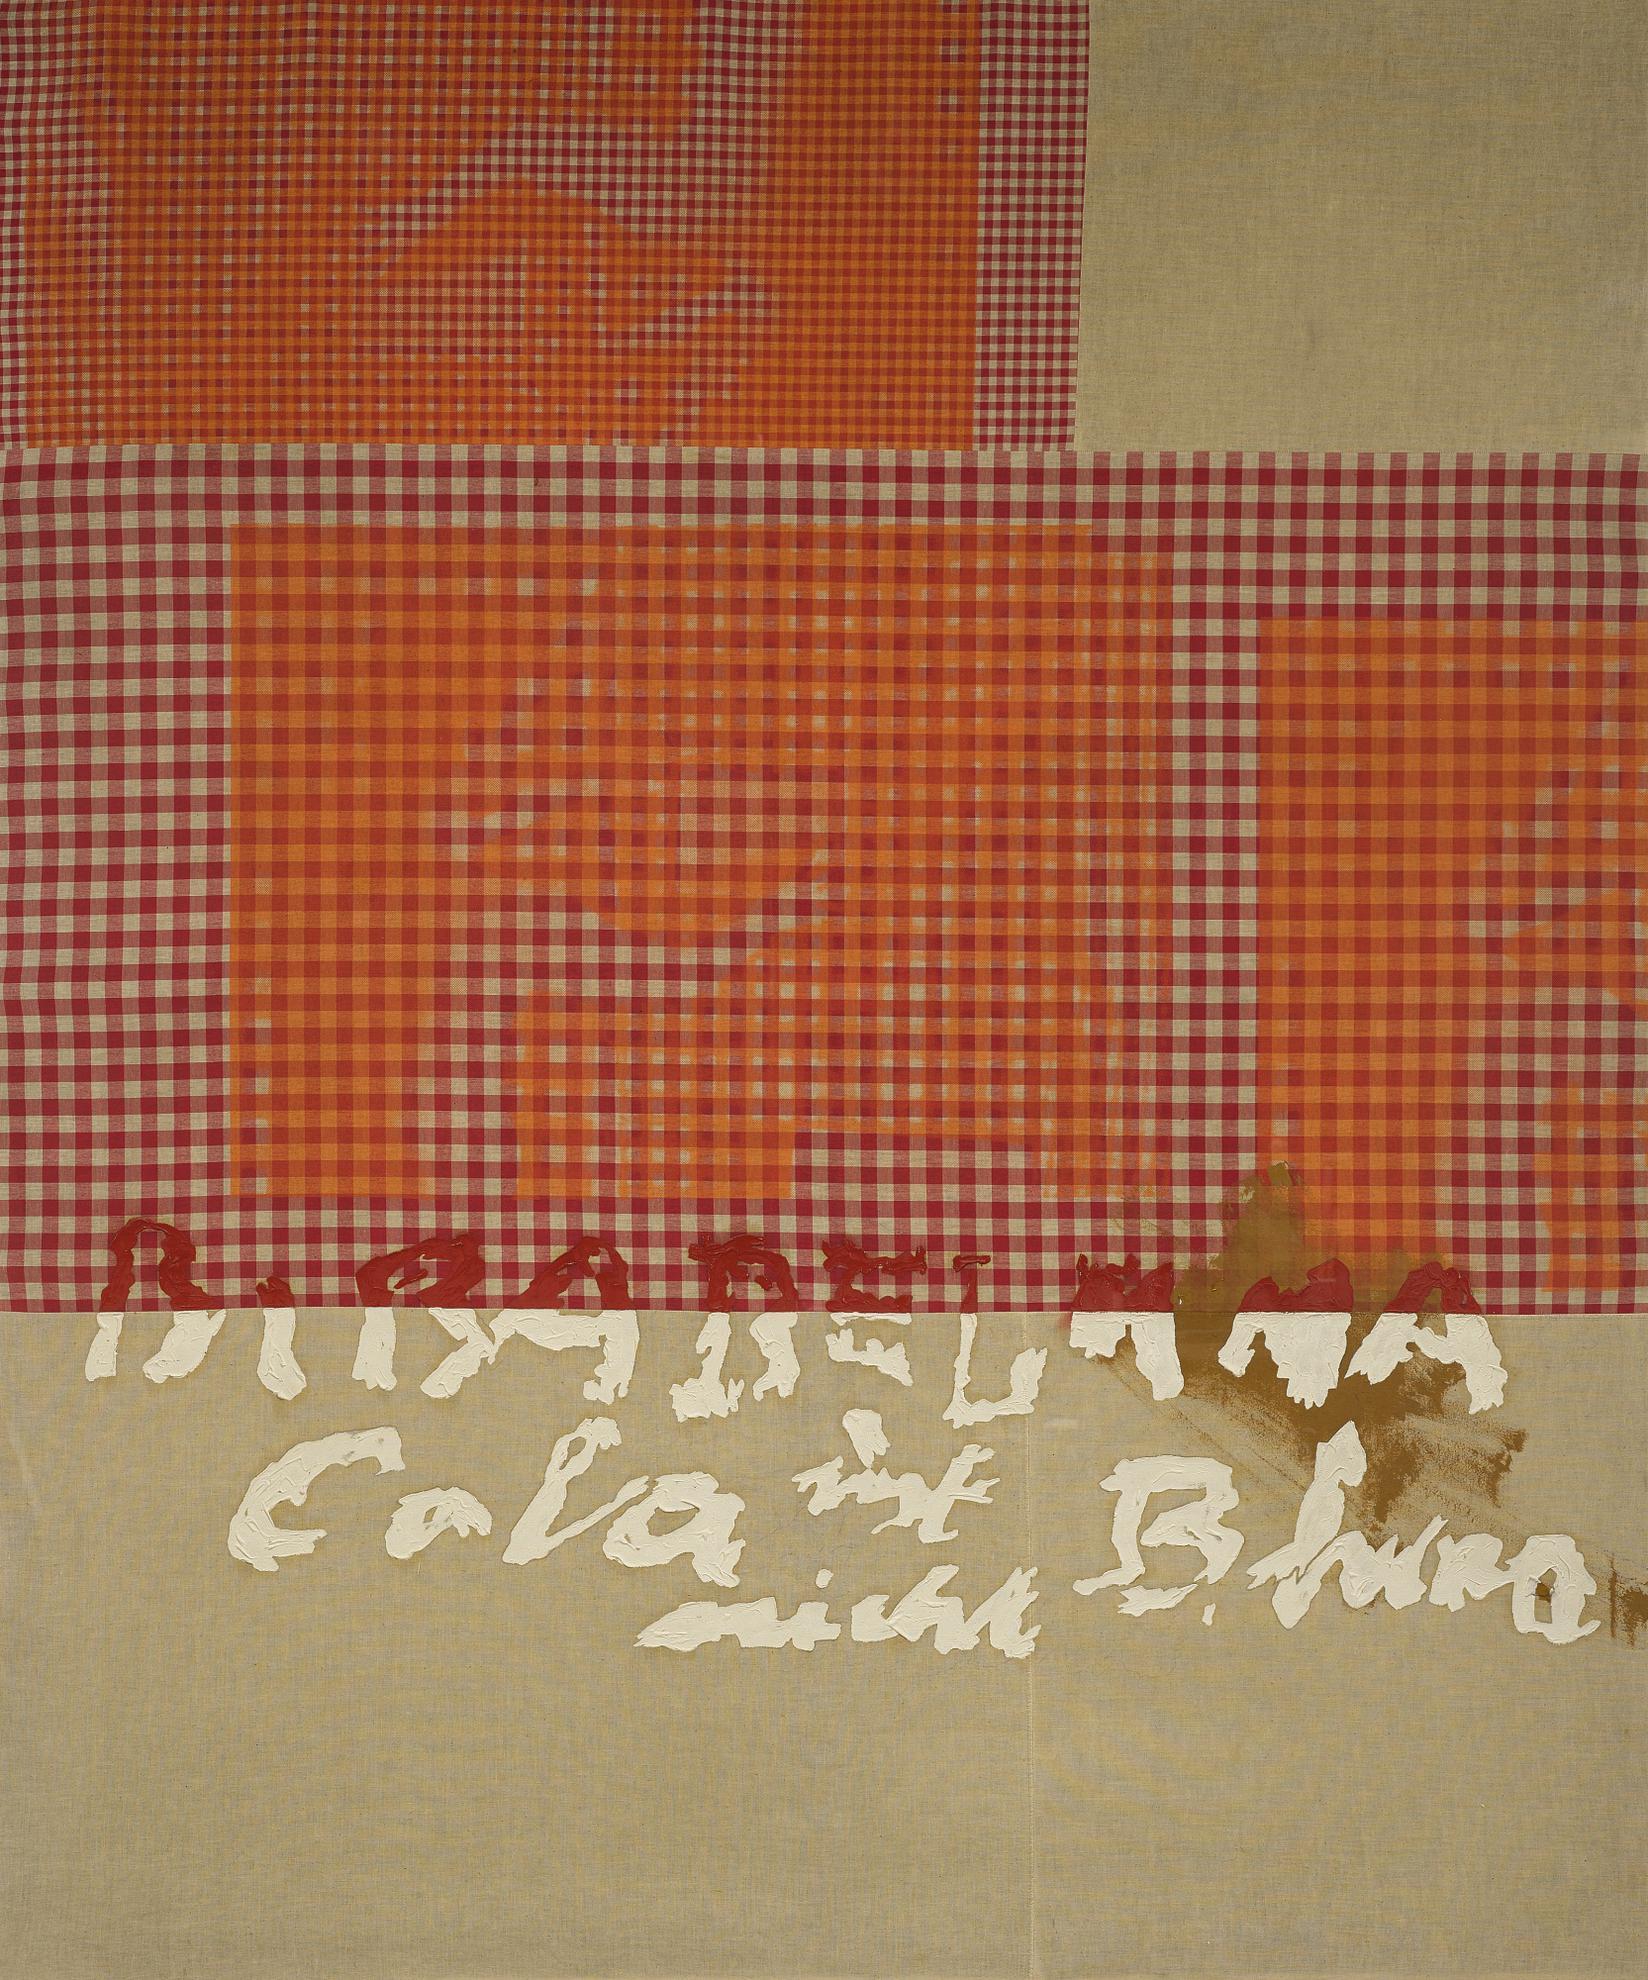 Martin Kippenberger-Bibabeluna (Cola Ist Nicht Bluna)-1987